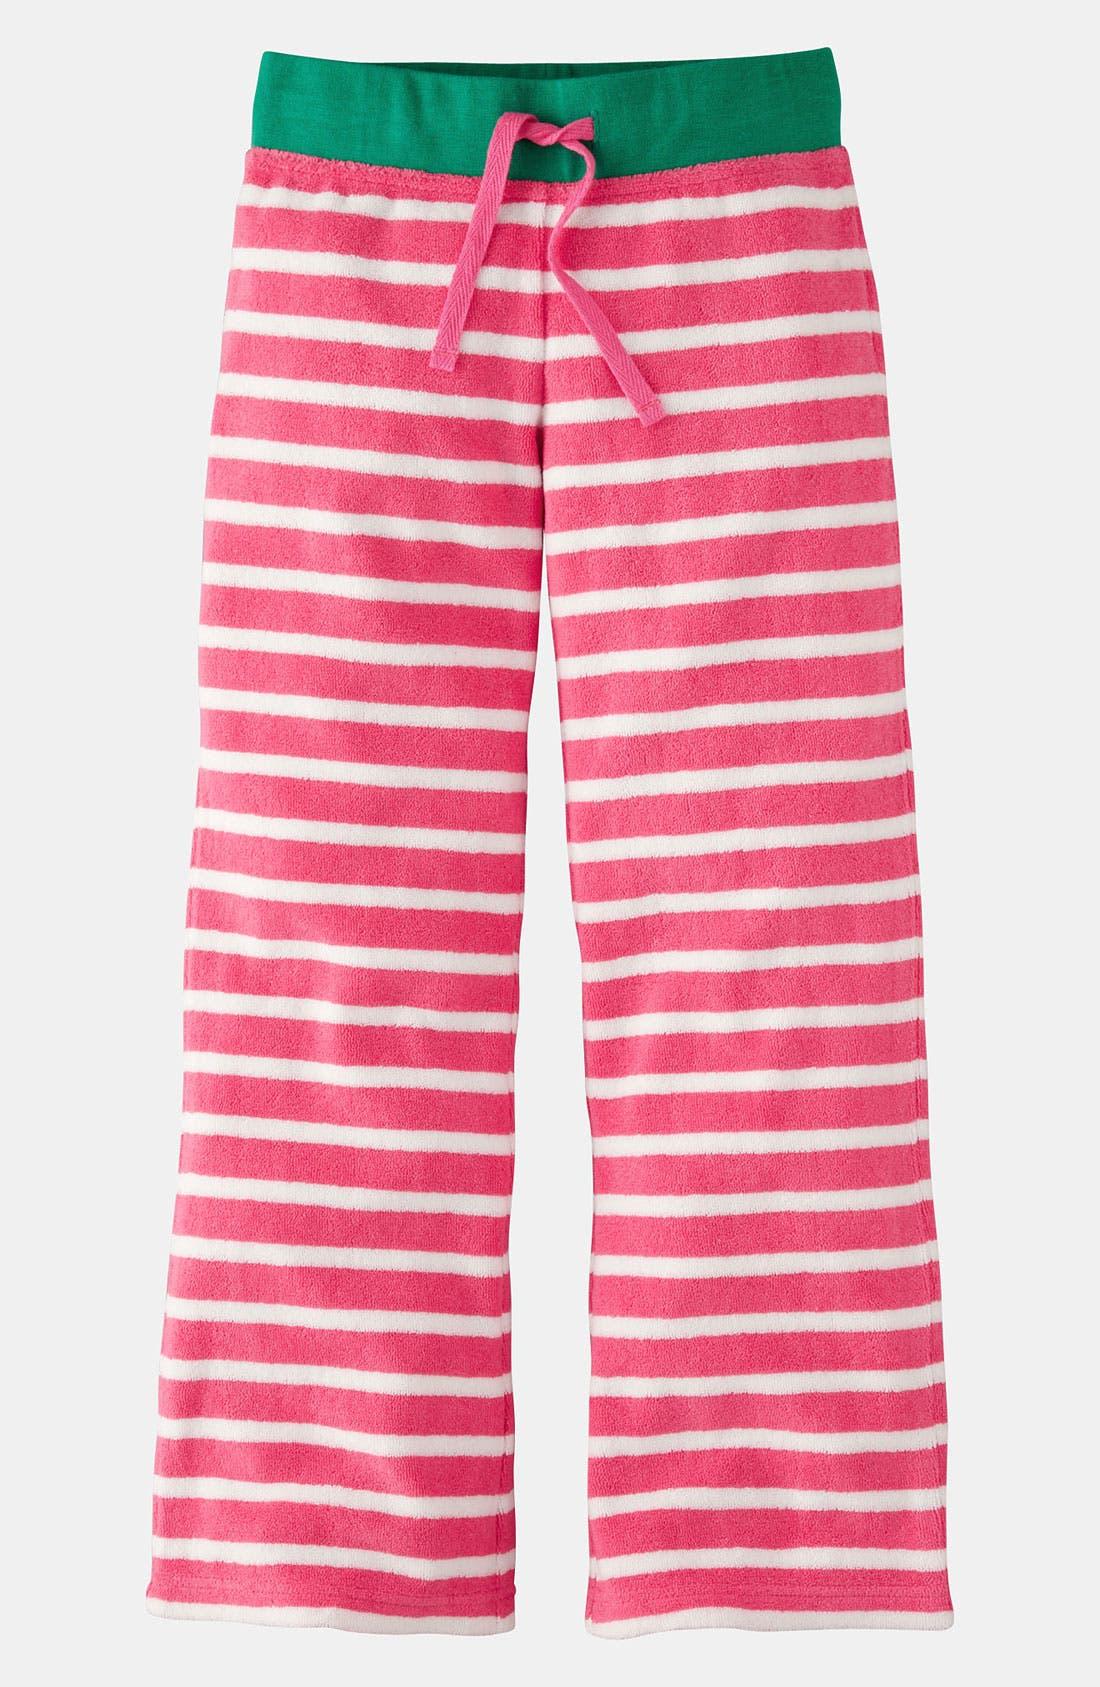 Main Image - Mini Boden 'Toweling' Pants (Little Girls & Big Girls)